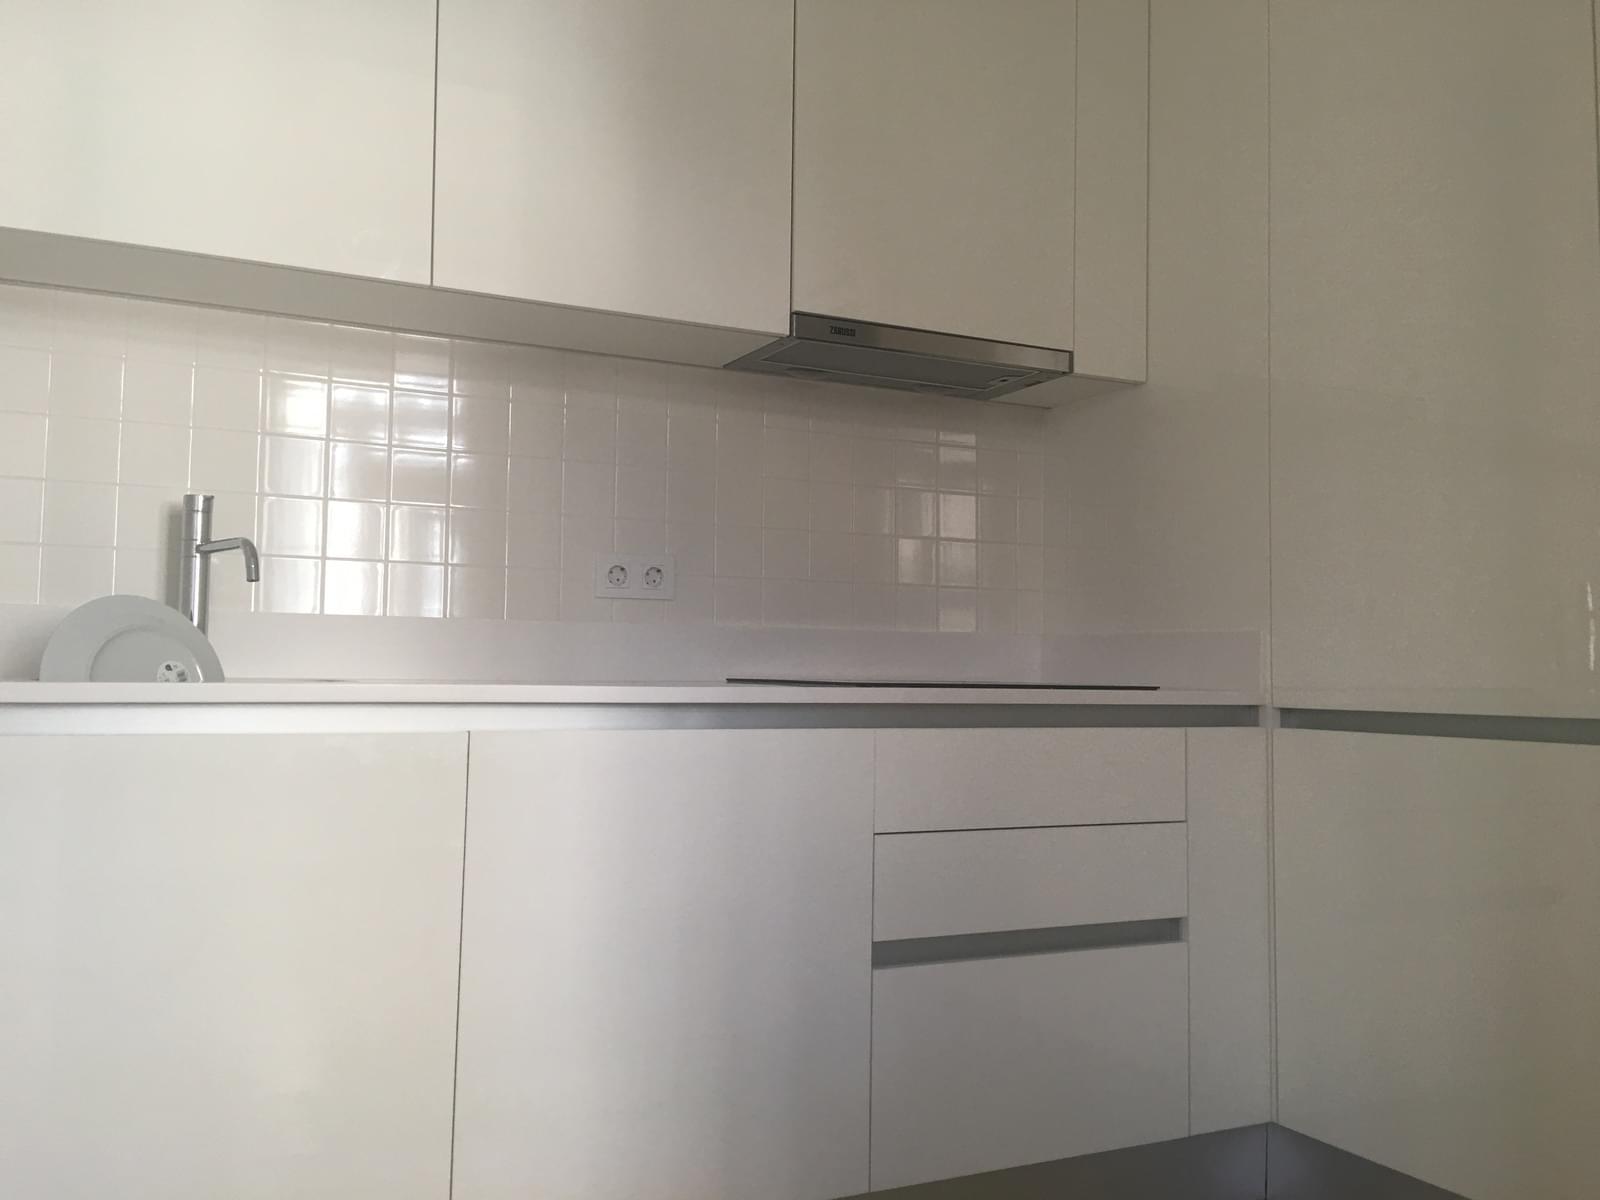 pf17866-apartamento-t1-lisboa-a0c9c2db-5aa5-4c94-9899-641672ab7ad2